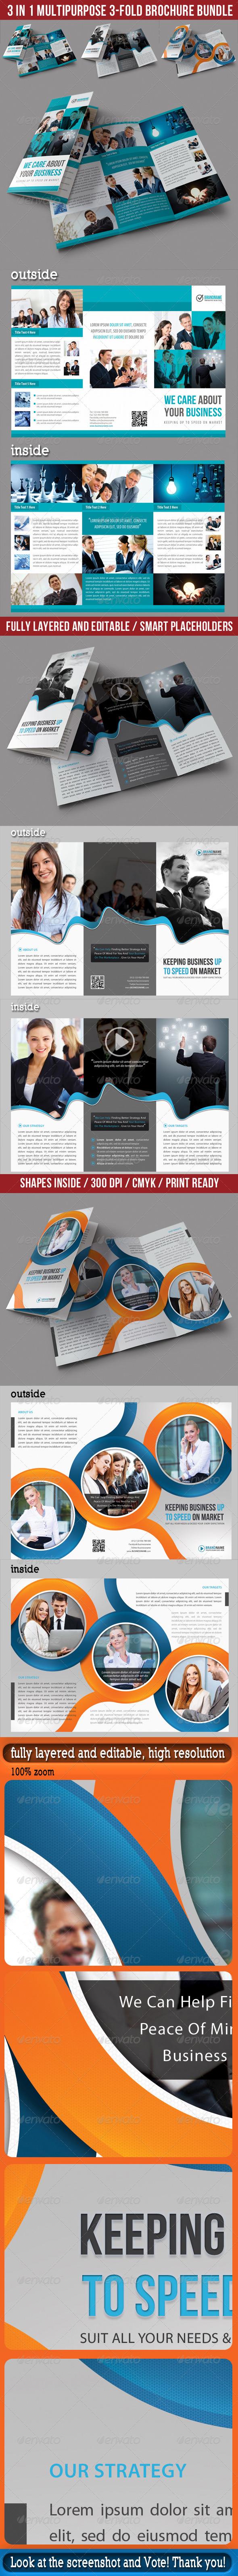 3 in 1 Corporate 3-Fold Brochure Bundle 02 - Corporate Brochures